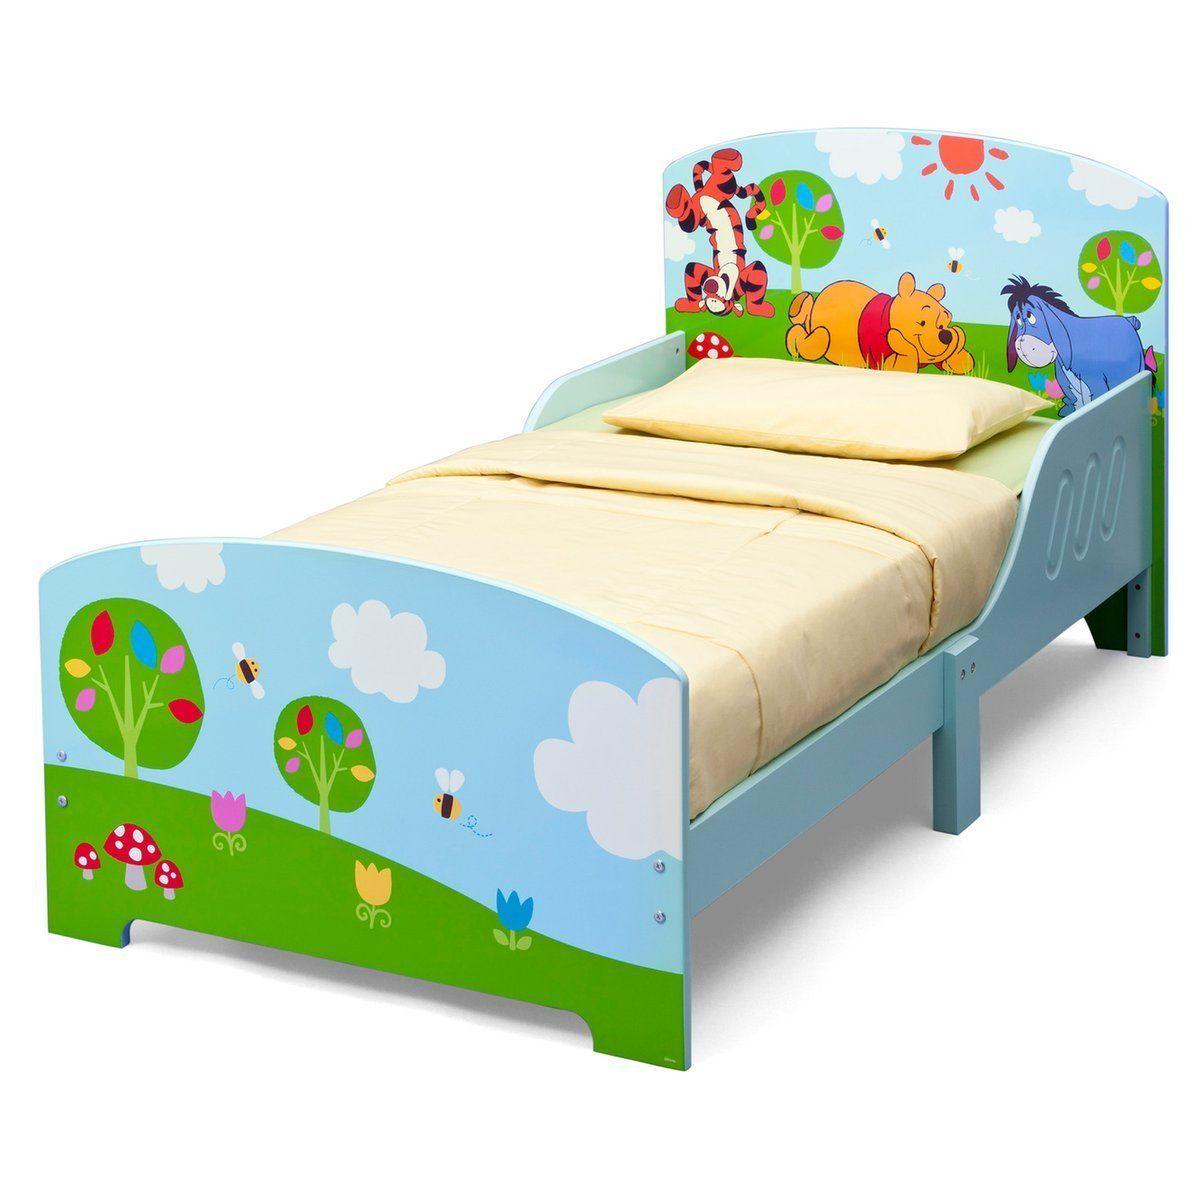 Cama infantil de madera Winnie The Pooh. BB87112WP, IndalChess.com ...